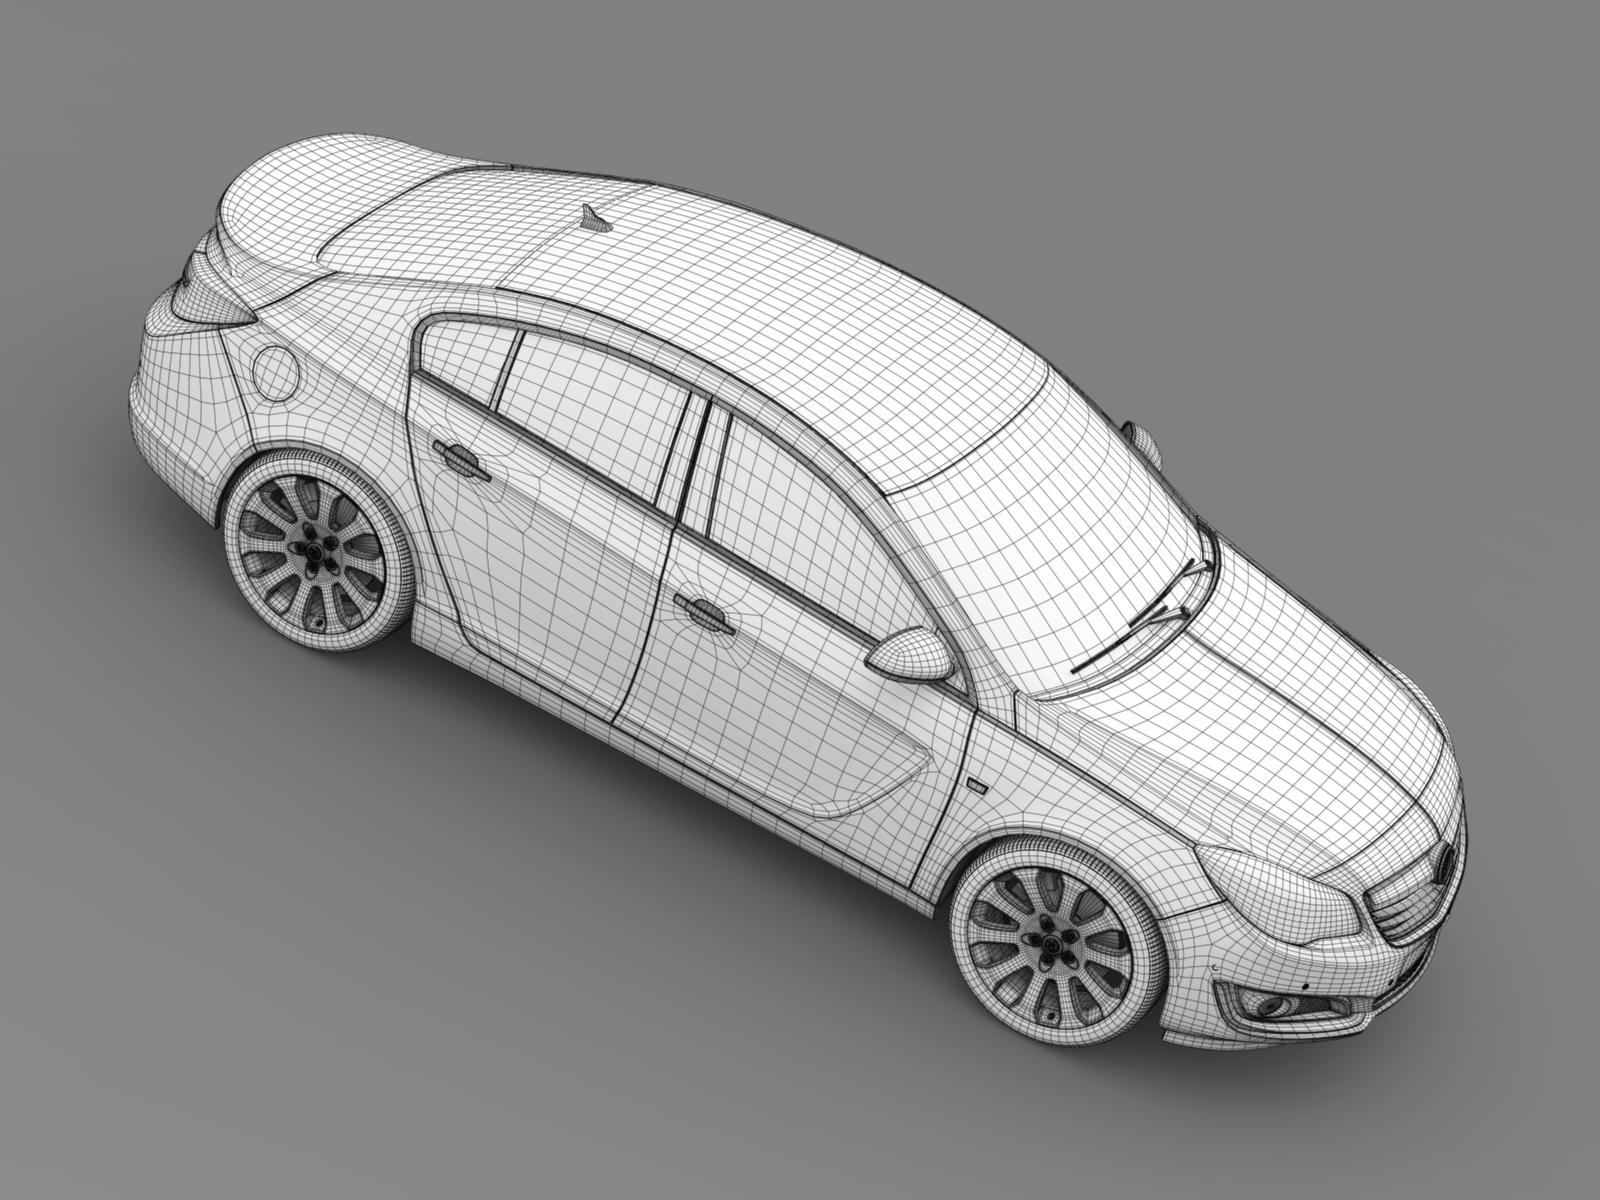 Vauxhall Insignia Turbo 2015 3d Model Vehicles 3d Models ...